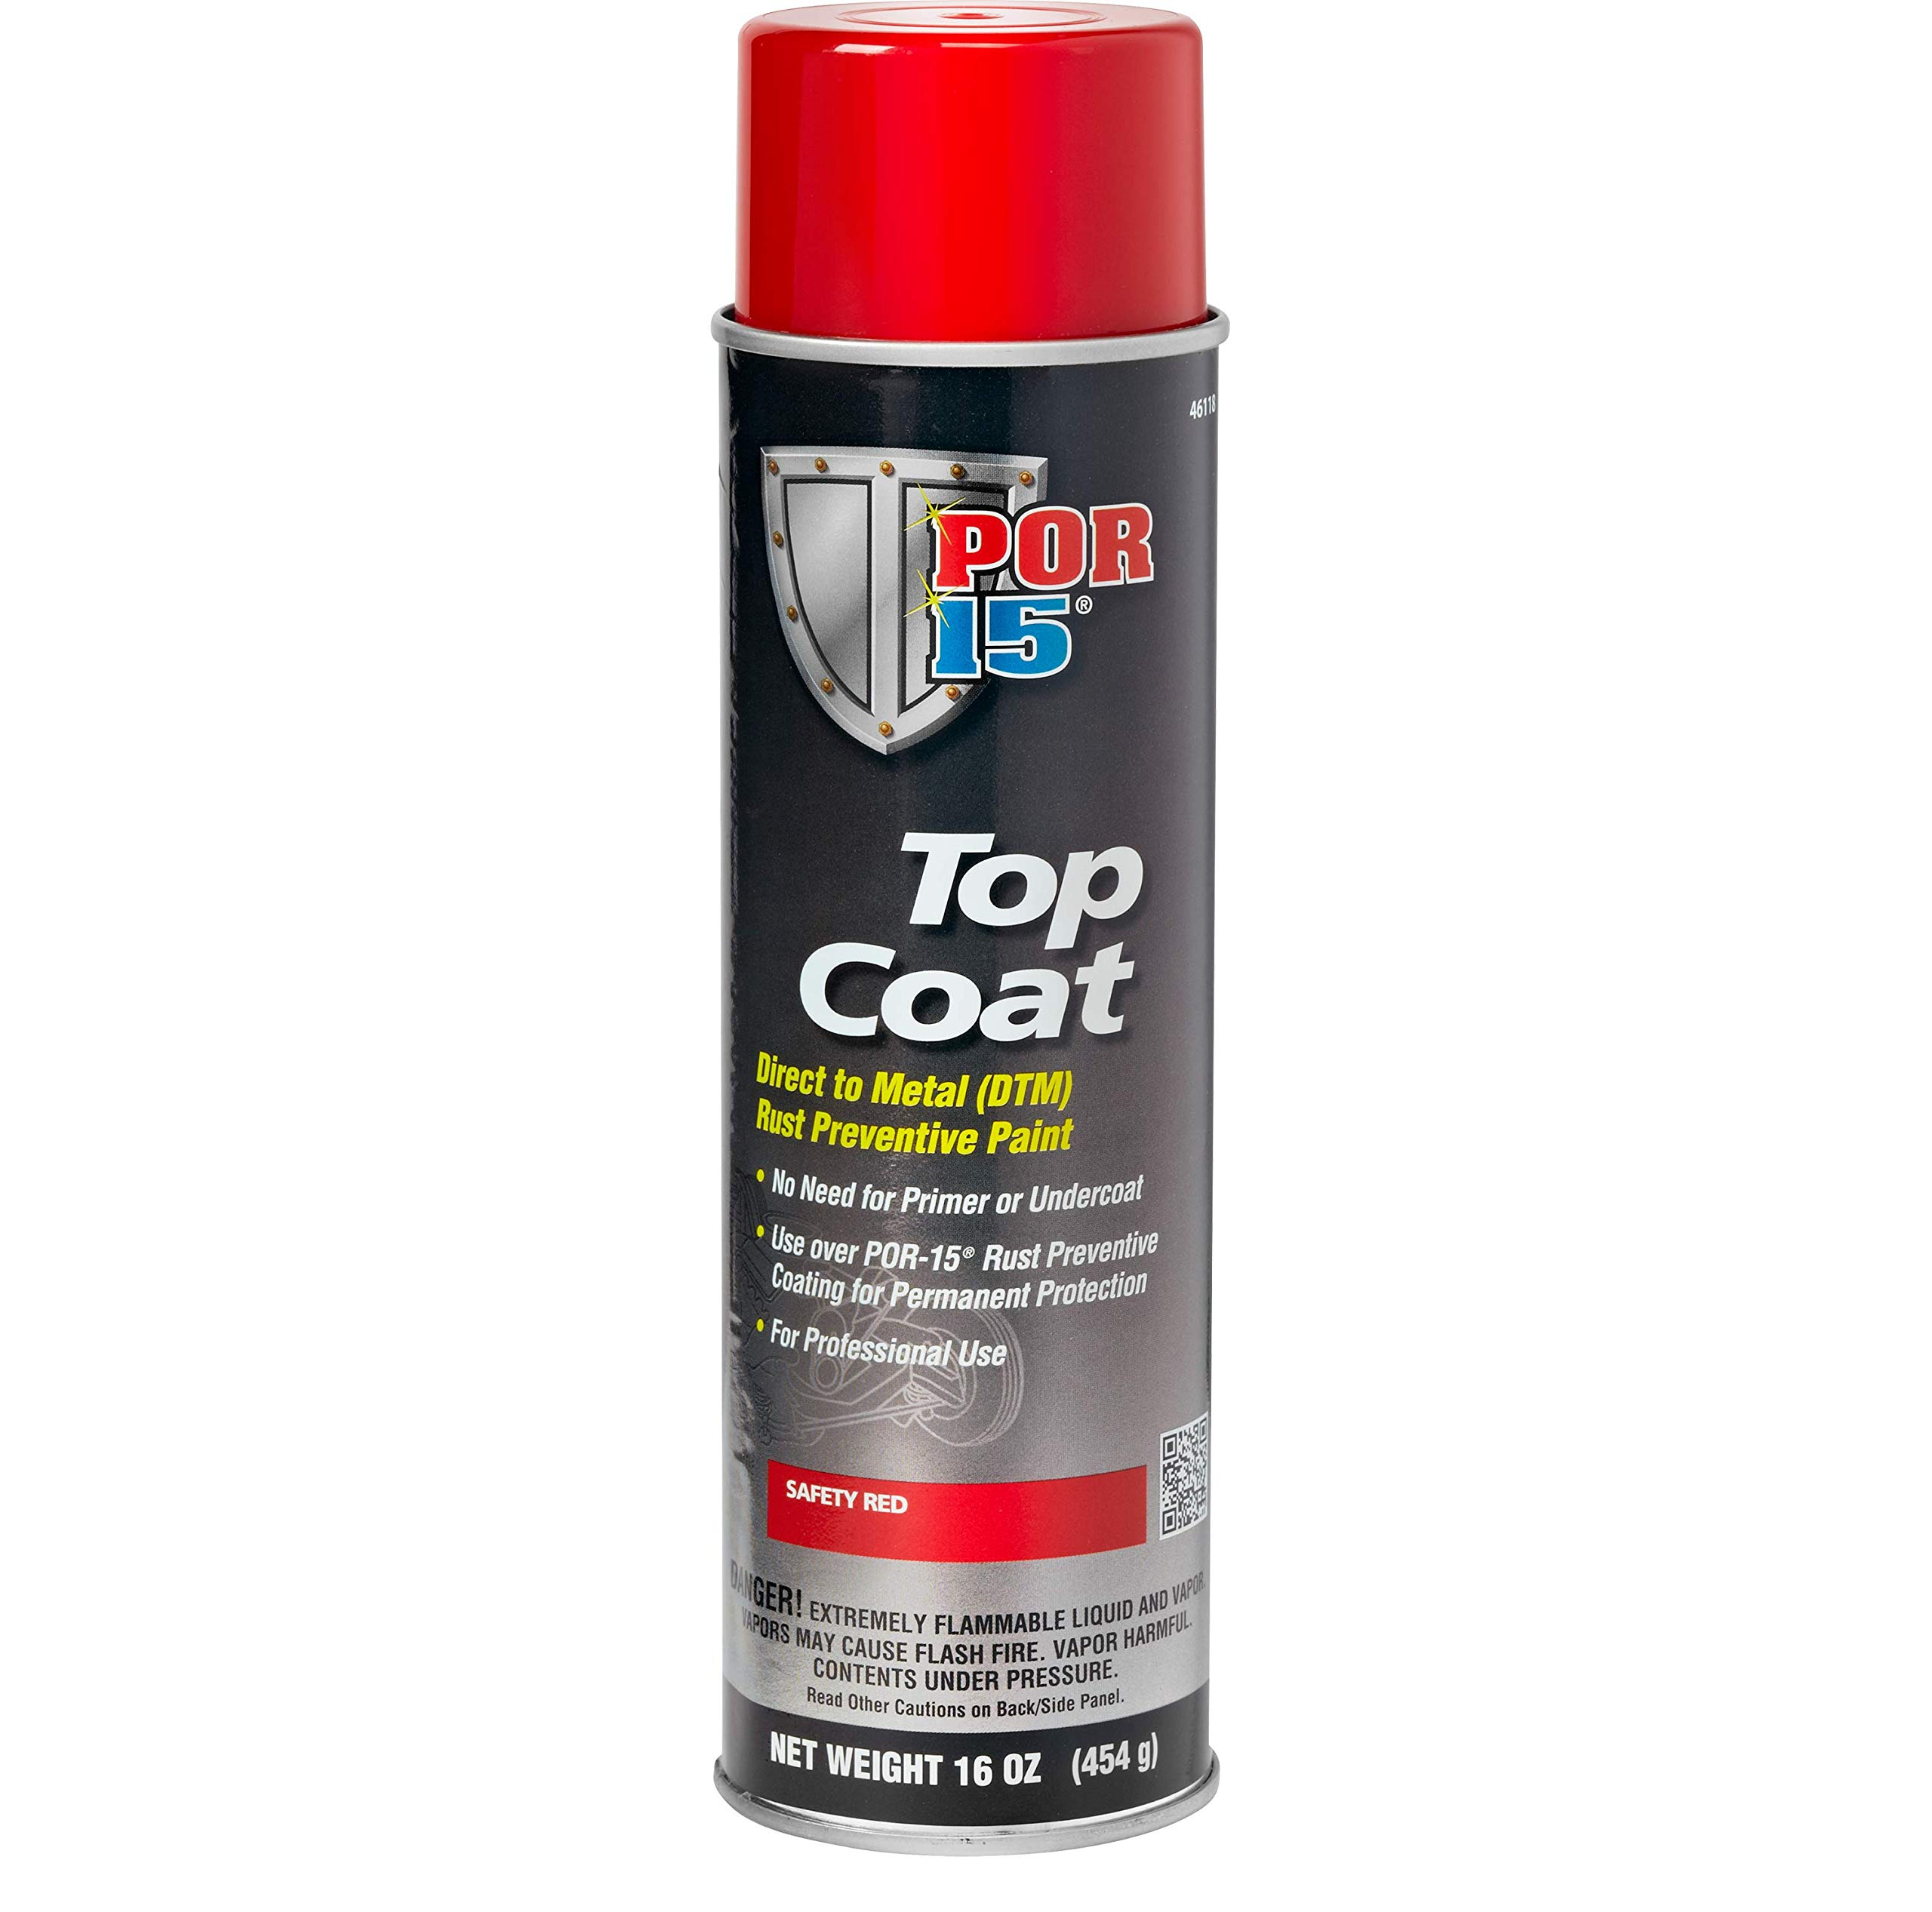 Amazon Com Por 15 46118 Top Coat Safety Red Spray Paint 16 Fl Oz Automotive